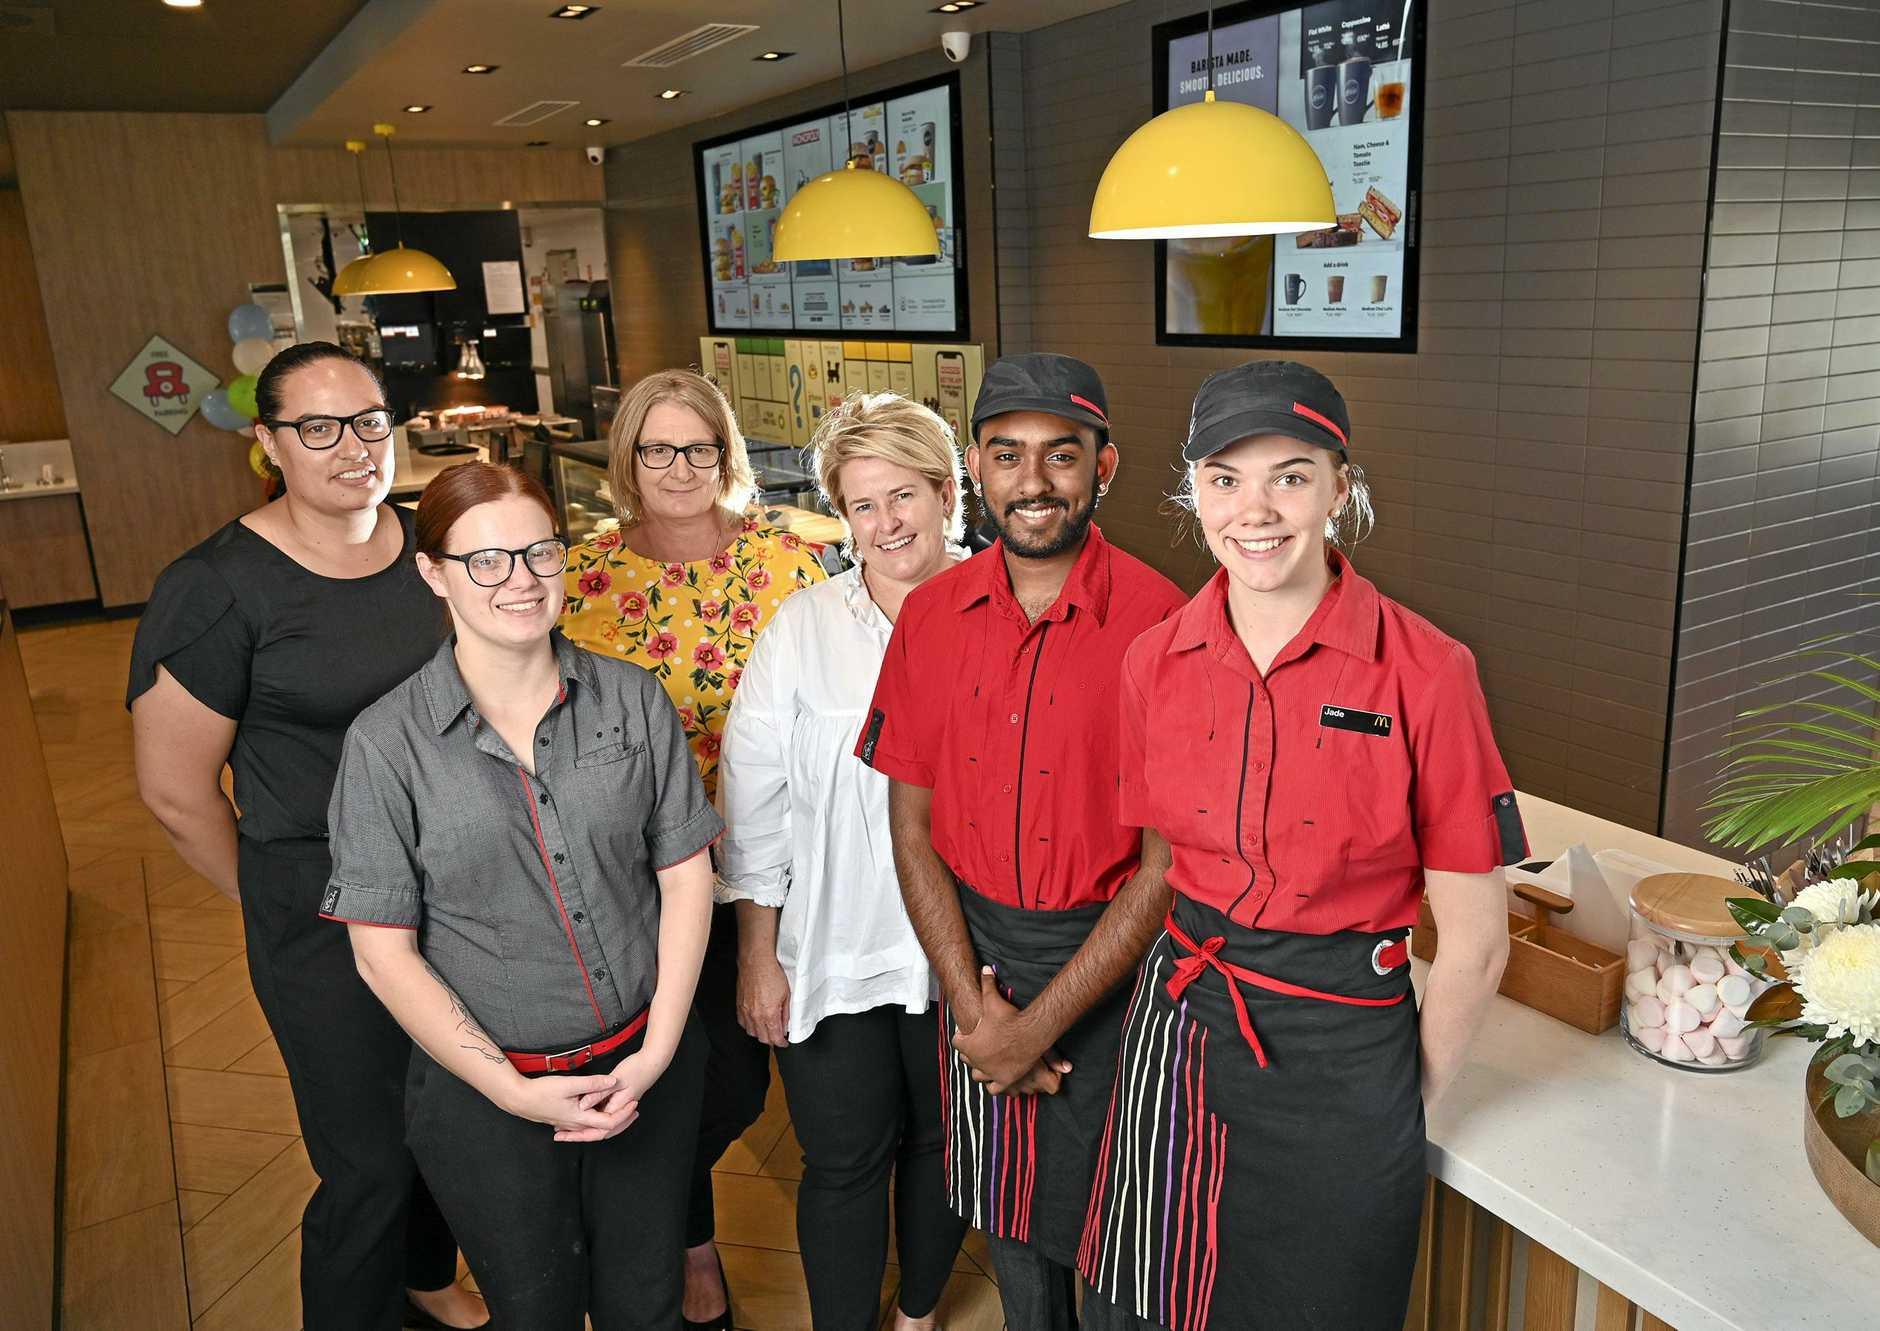 McDonald's Camira turns 1. Tiana Tipene, Hayley Edmonds, Jane McEwen, Lisa Mackintosh, Sai Rajagopalan and Jade Bauer.